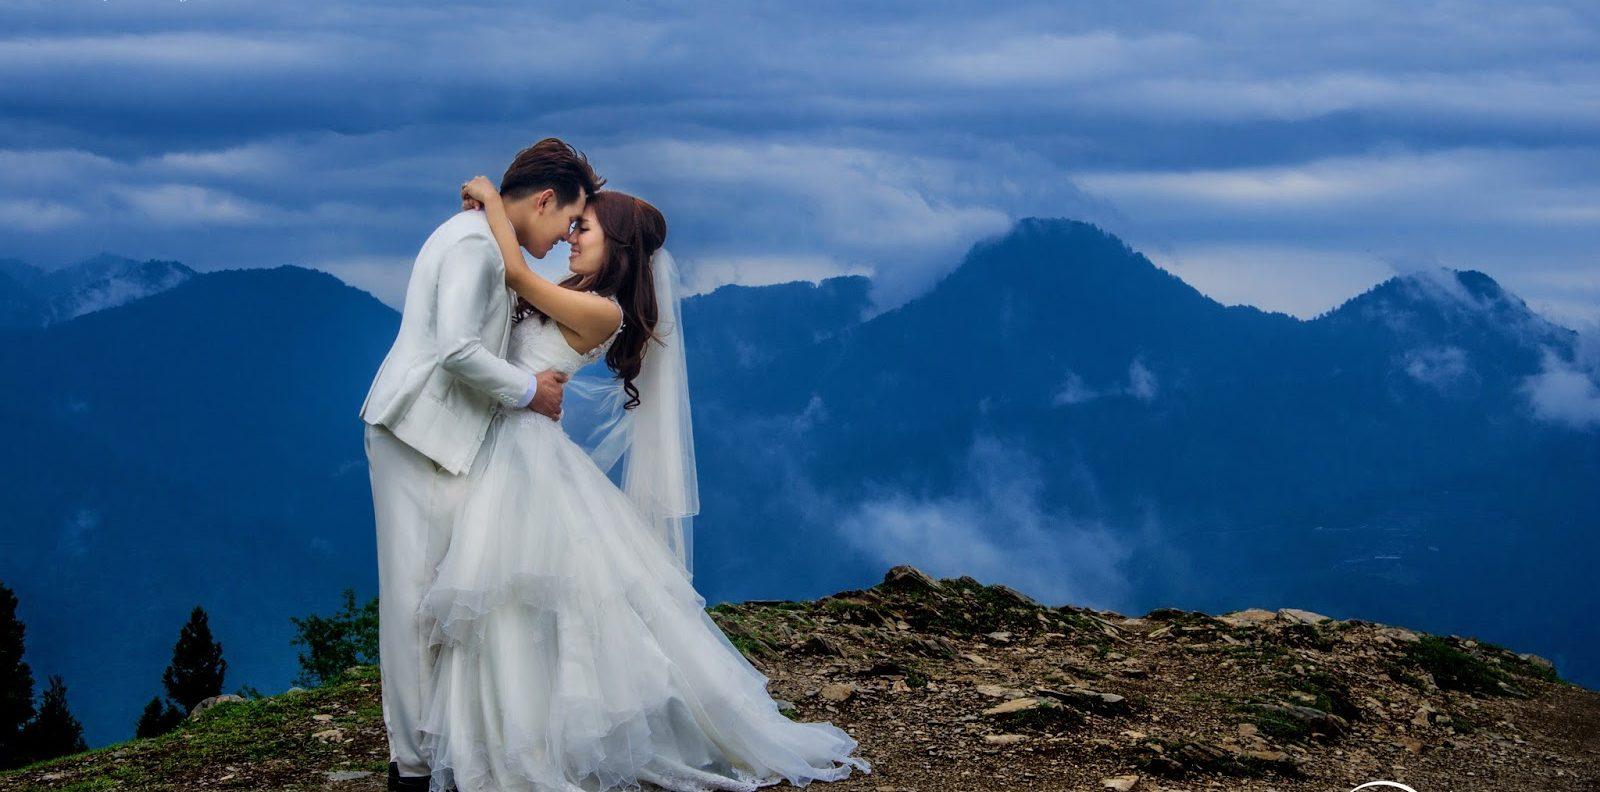 wedding anniversary tour romantic getaway package in nepal